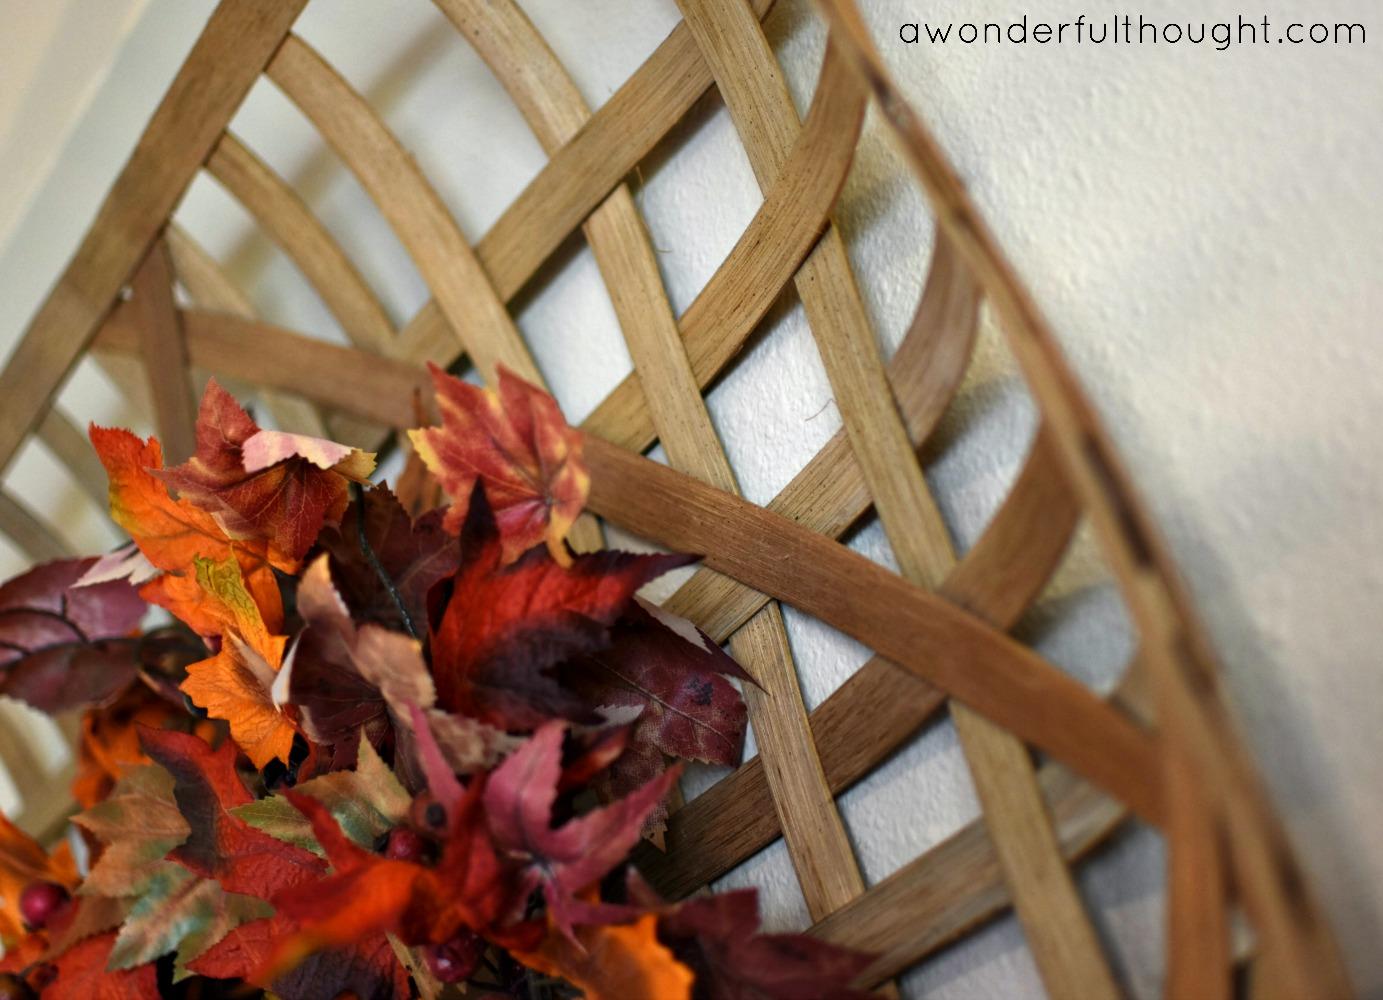 A Wonderful Thought | DIY Tobacco Basket | www.awonderfulthought.com